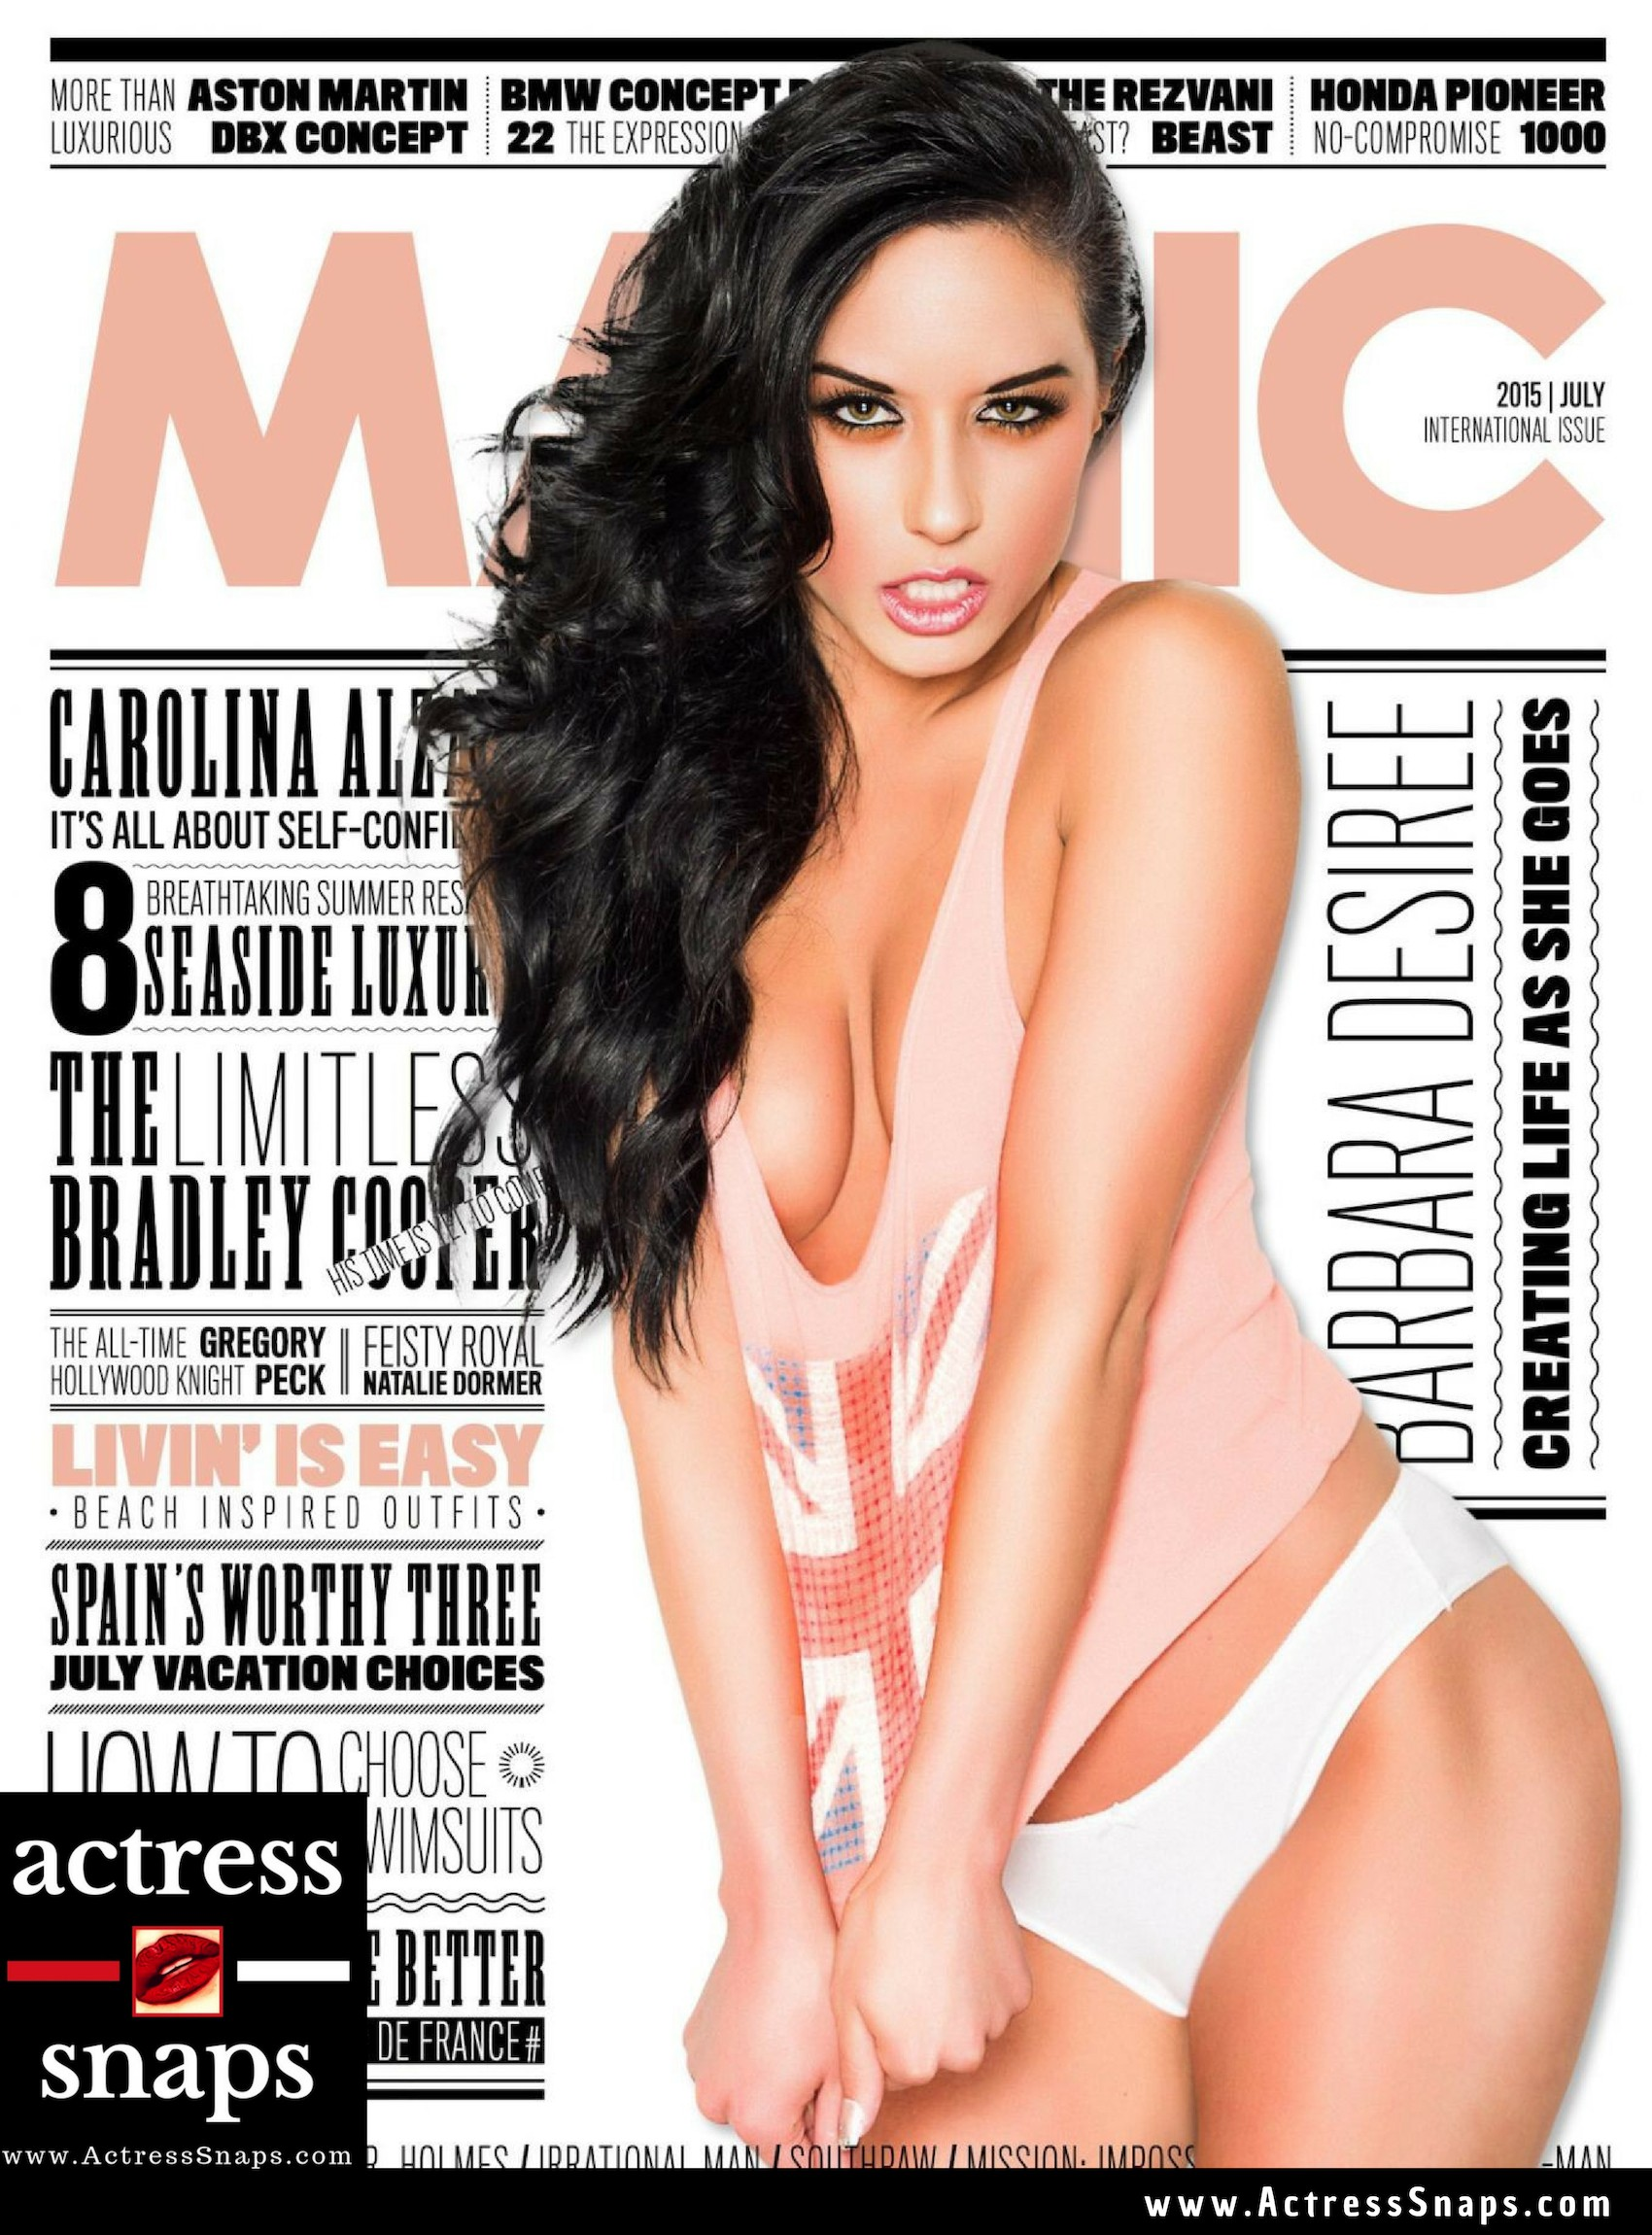 Barbara Desiree - Manic Magazine Photos - Sexy Actress Pictures | Hot Actress Pictures - ActressSnaps.com